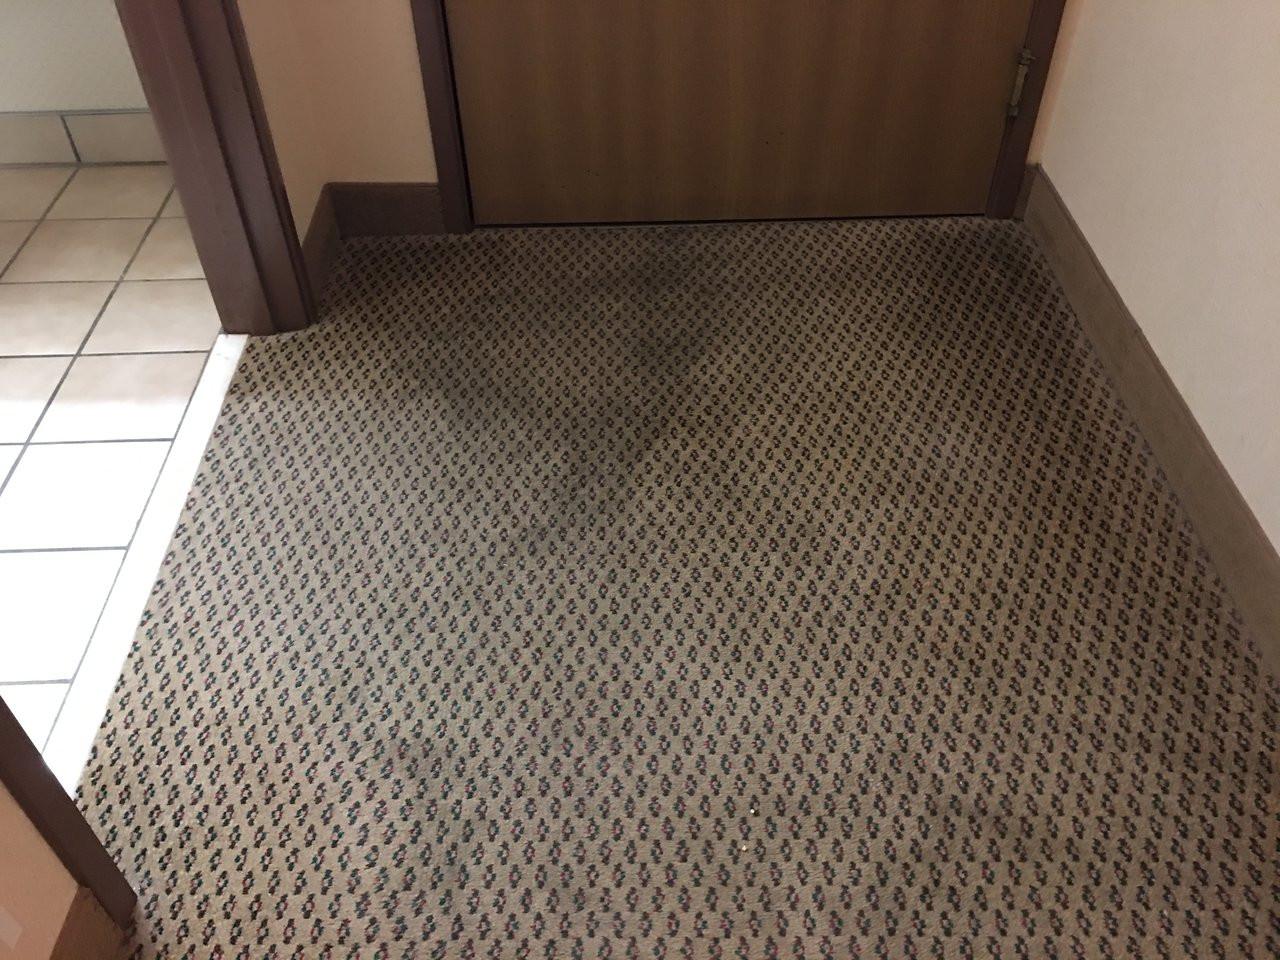 michigan hardwood floors services llc of hometown inn 84 i¶8i¶9i¶ updated 2018 prices motel reviews intended for hometown inn 84 i¶8i¶9i¶ updated 2018 prices motel reviews indian river mi tripadvisor